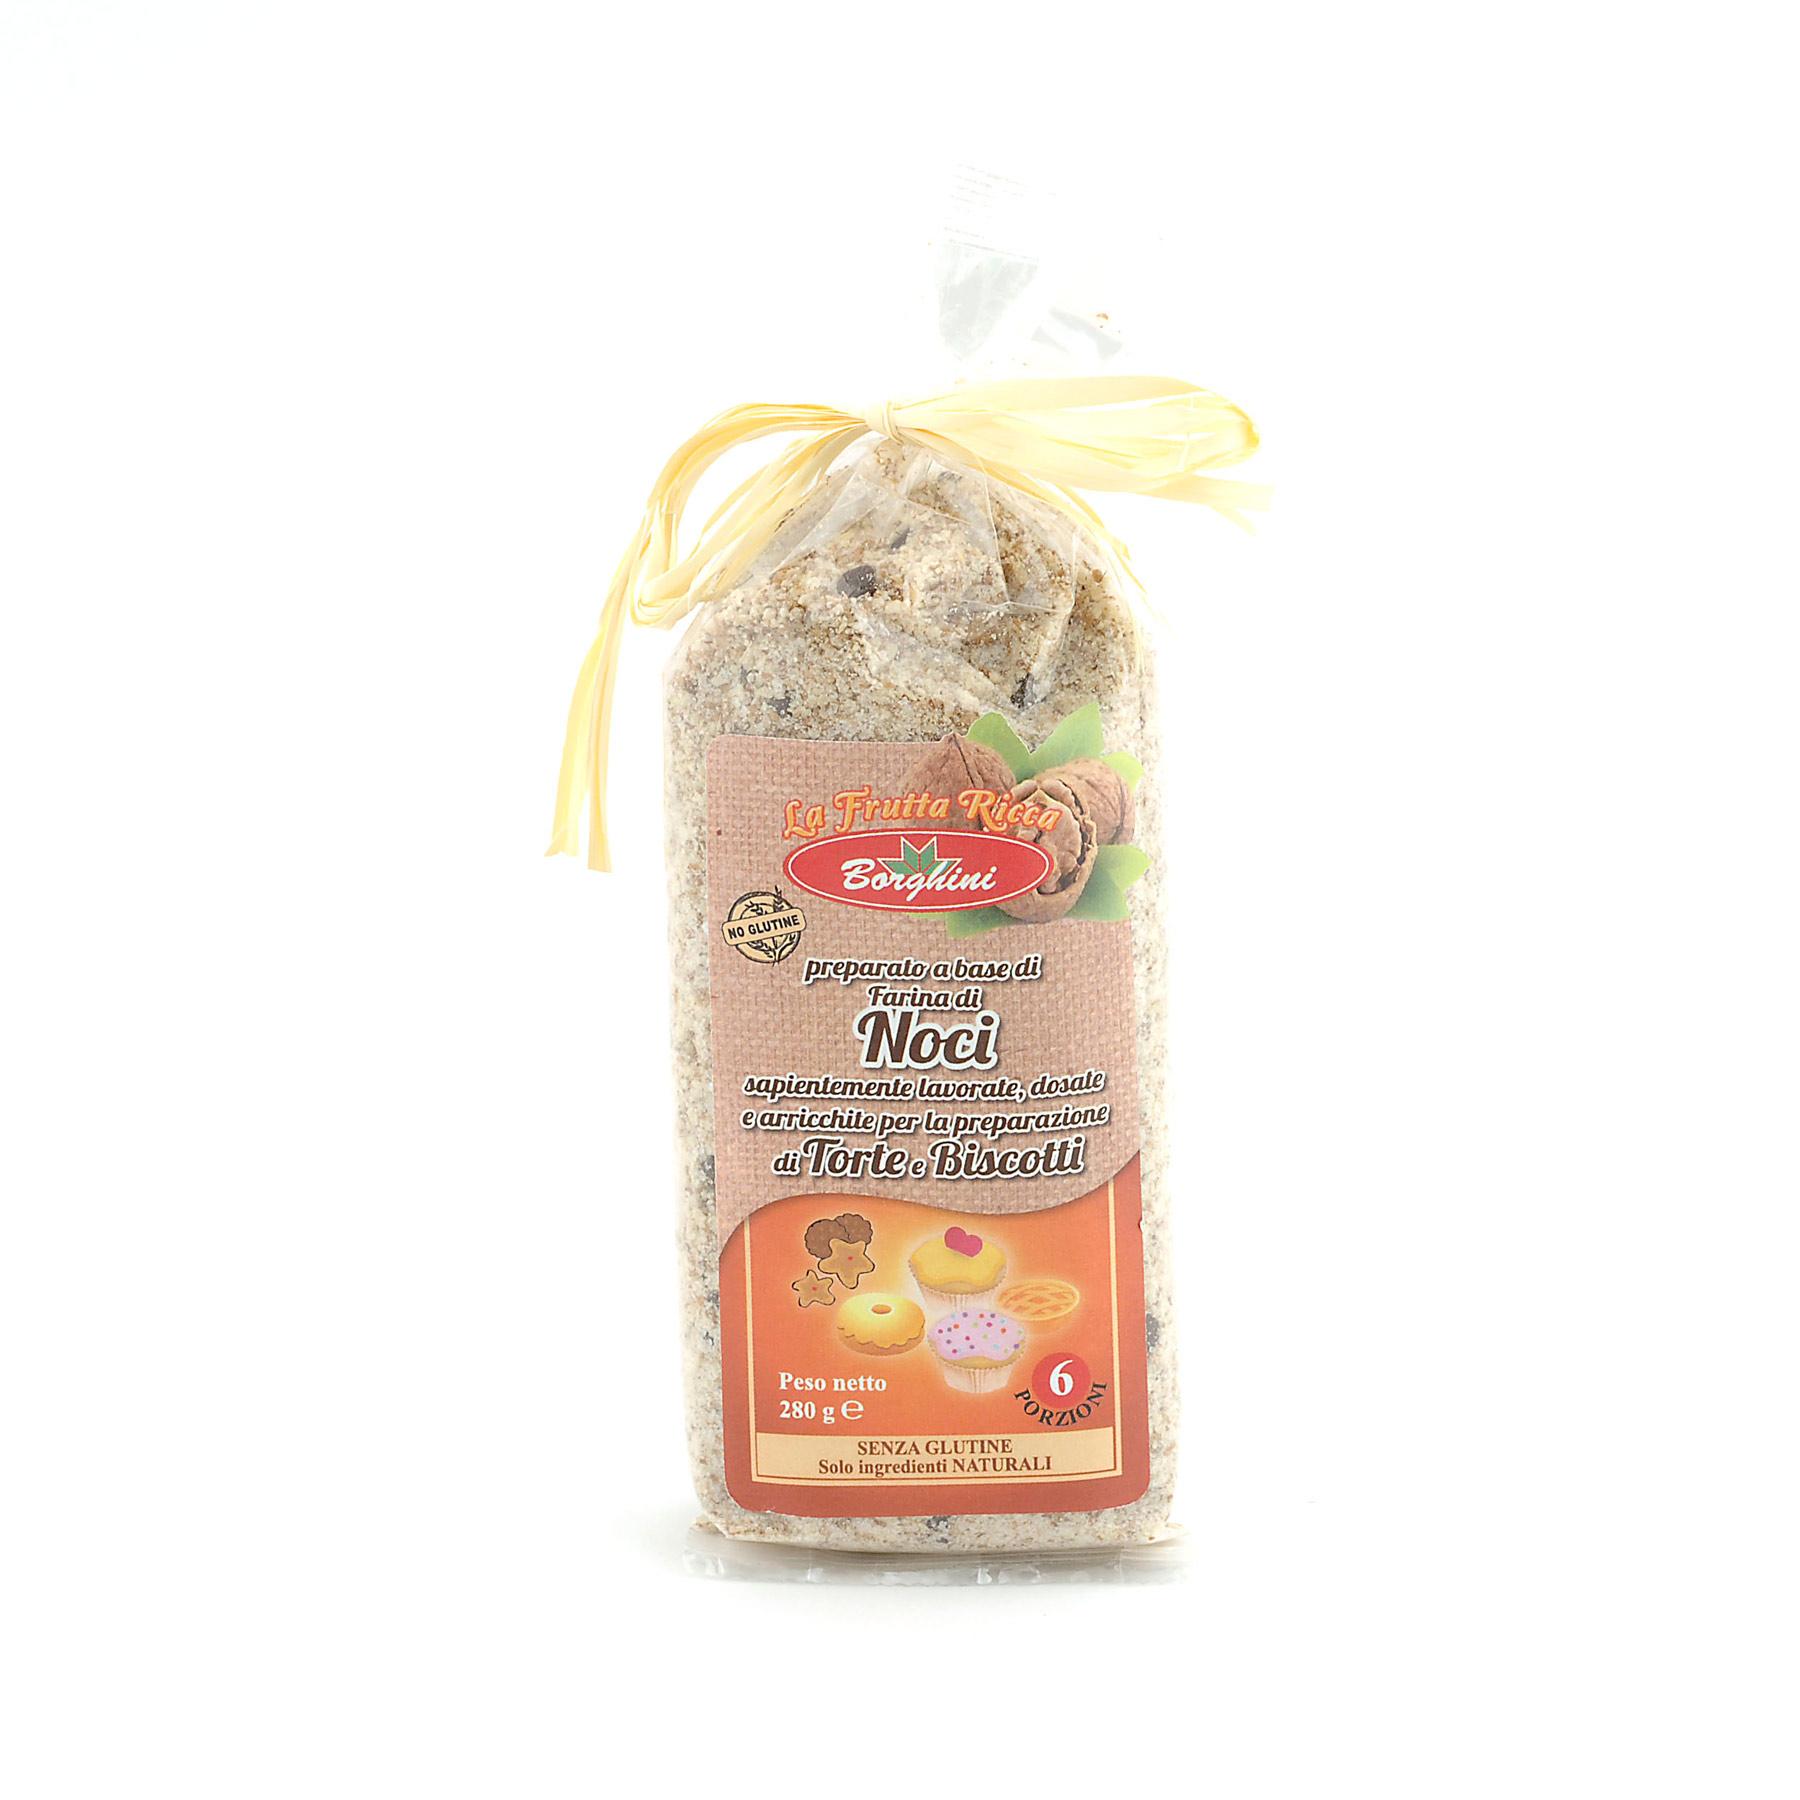 'Nocciola' Hazelnut Cake mix *Gluten free* from Borghini